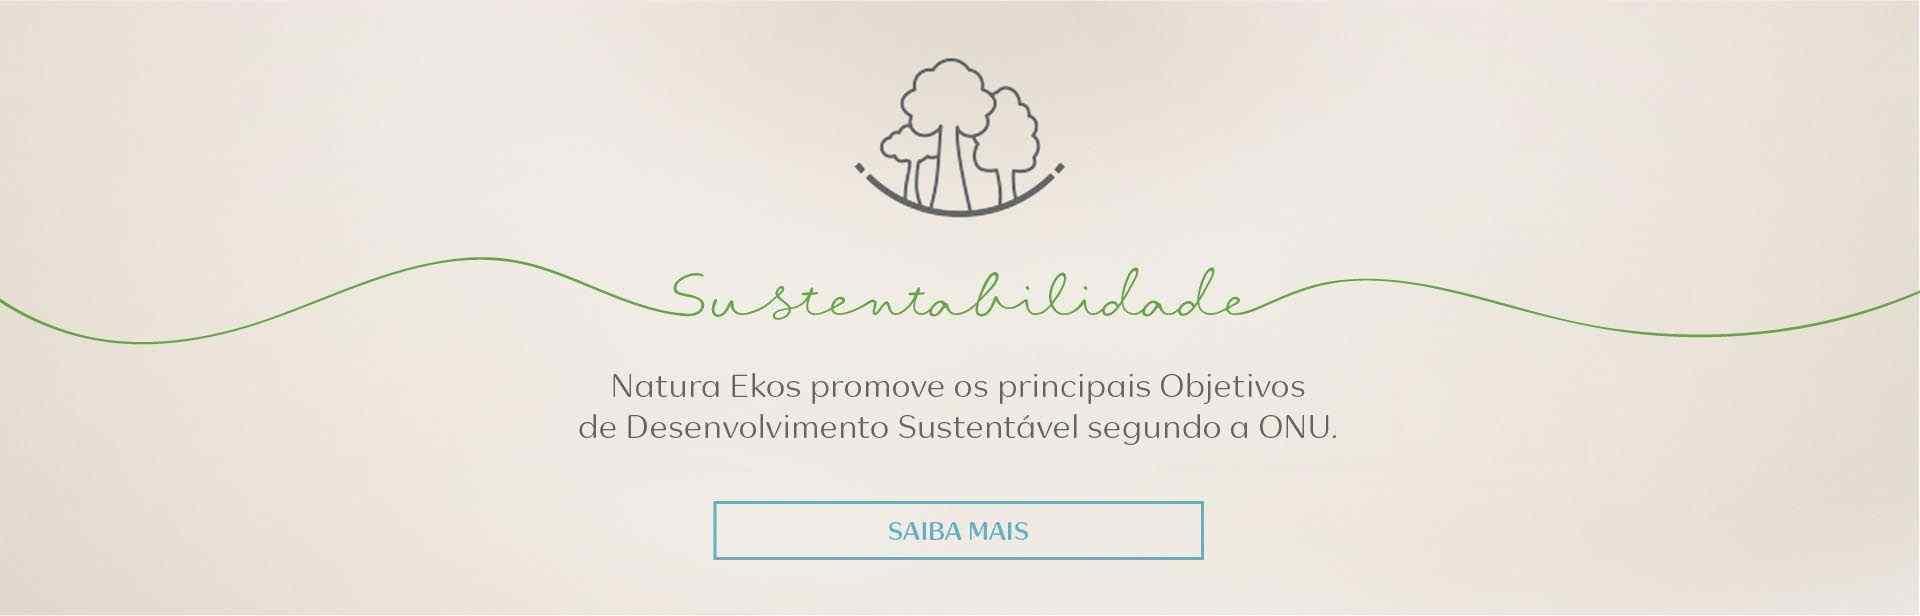 ekos-geral-sustentabilidade-desktop-compressed